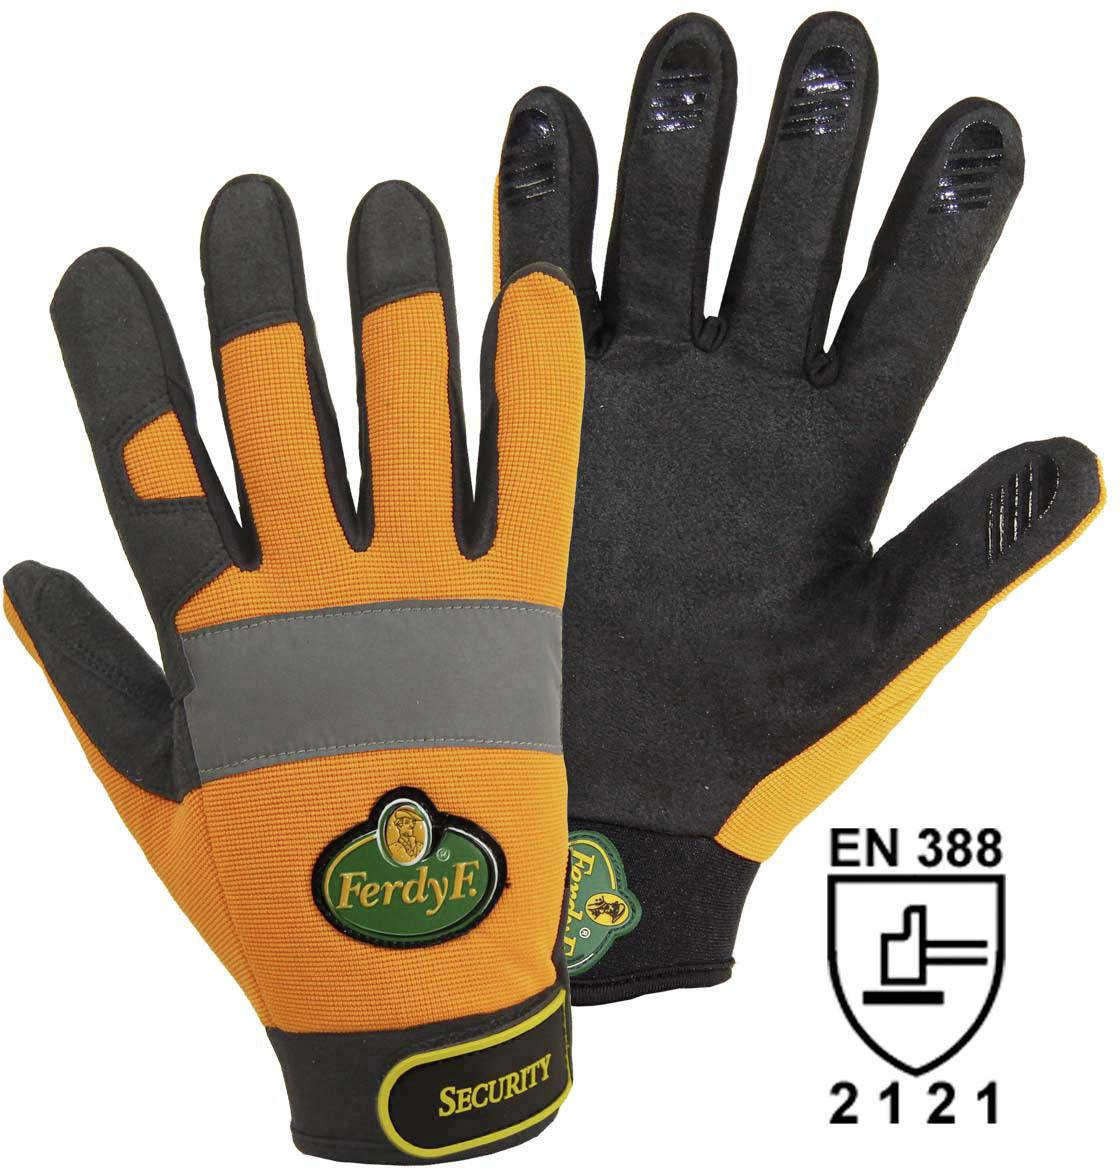 Montážne rukavice FerdyF. Mechanics Security 1905, velikost rukavic: 10, XL